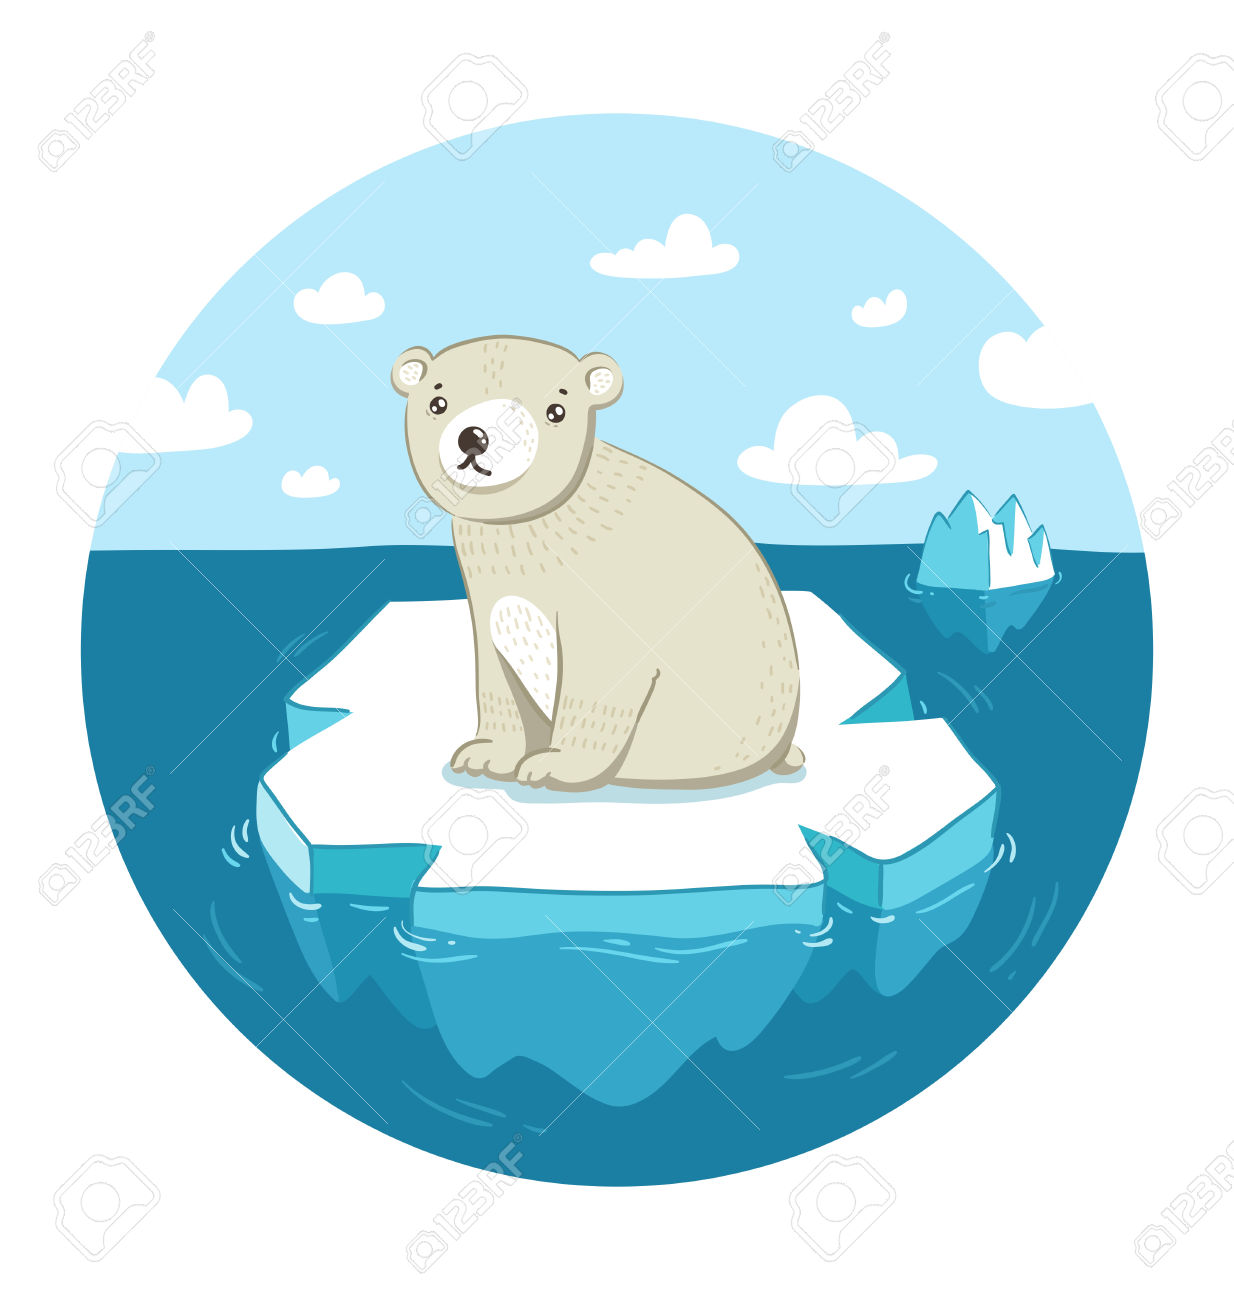 Sad Polar Bear Sitting On Ice Floe Royalty Free Cliparts, Vectors.